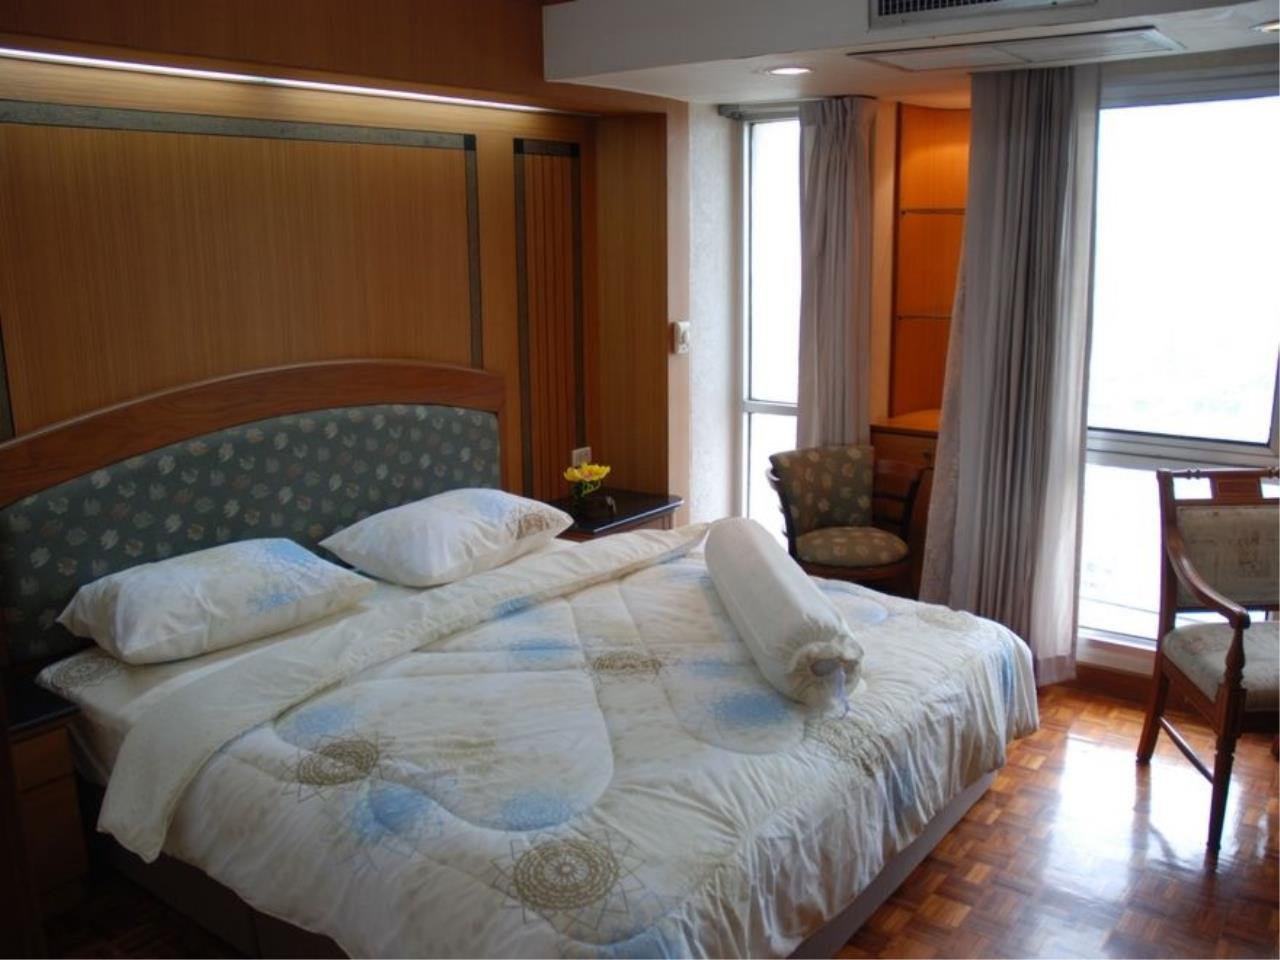 Siam Prop Agency's Shukhumvit Suits Condo for Rent / 1 Bed 1 Bath Shukhumvit Soi 13 / Good deal 19,900/month 2